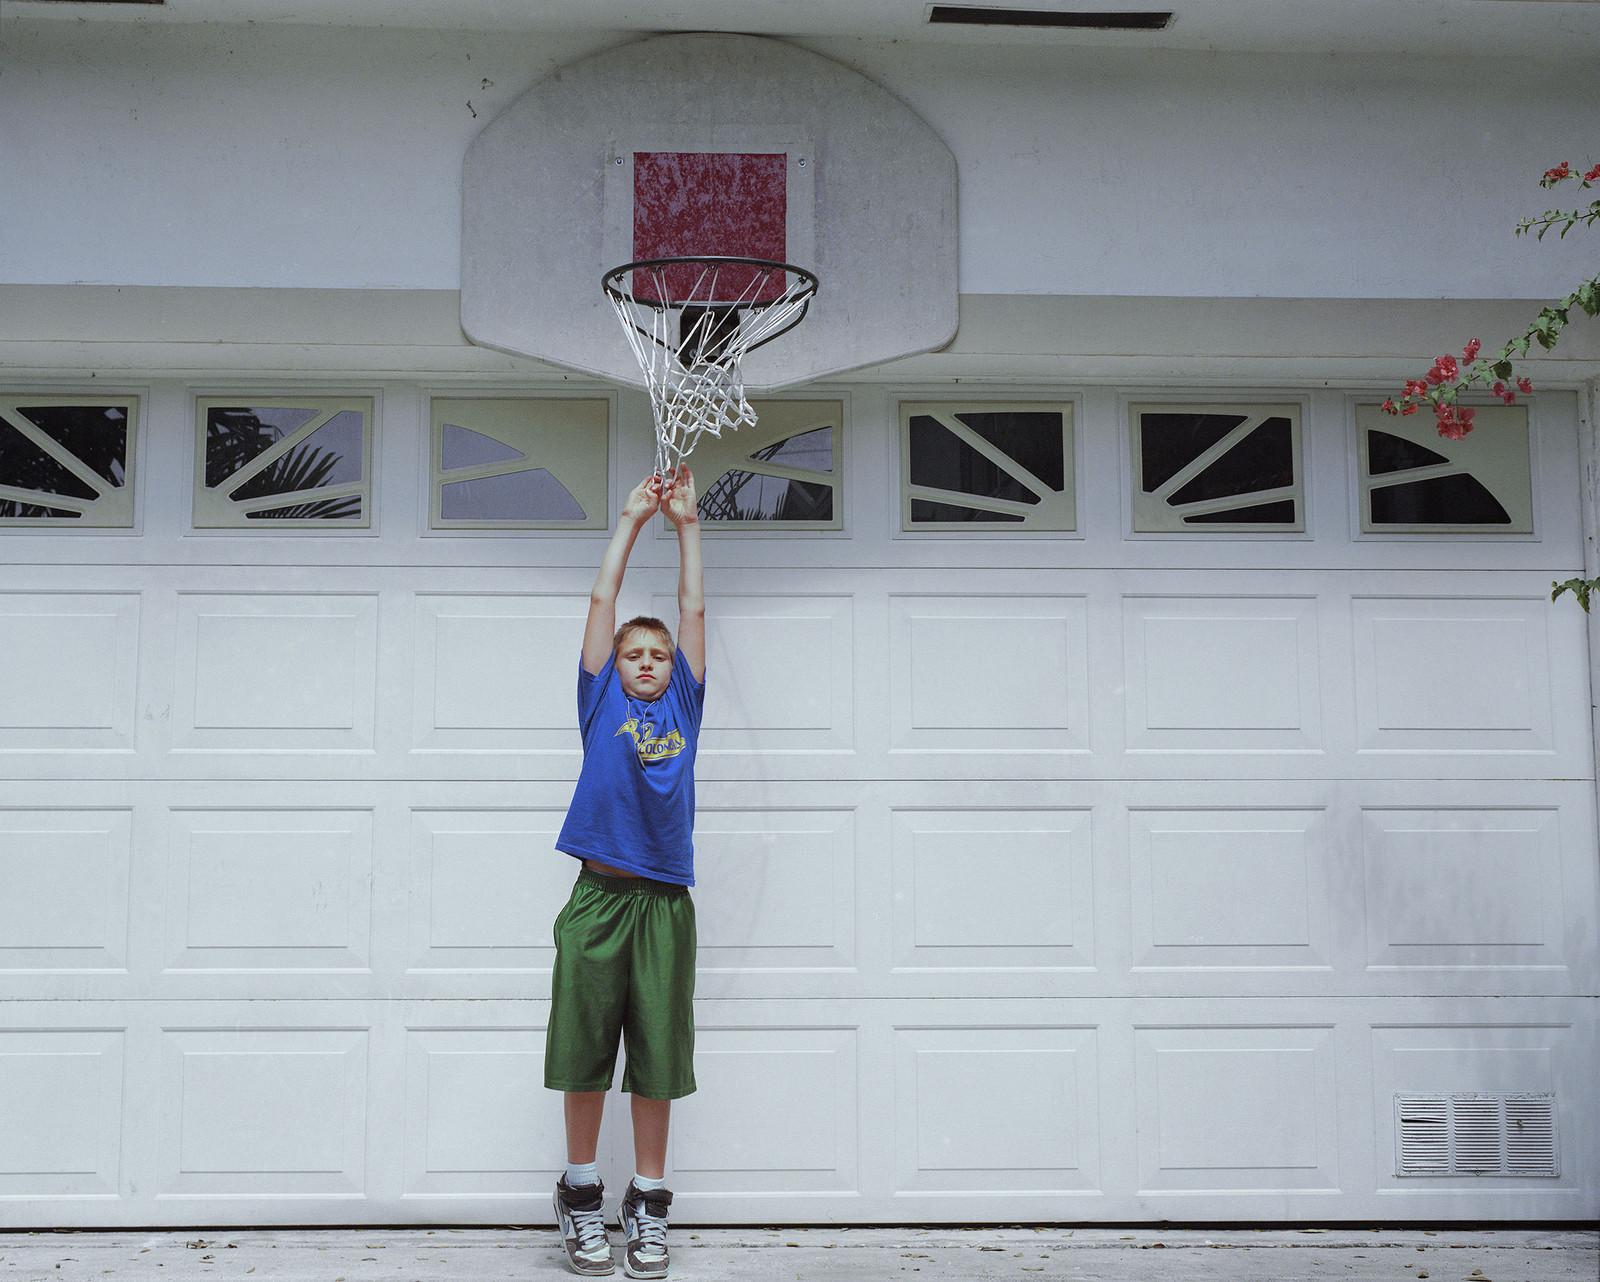 Danny_Basketball_hoop,xlarge.1372803240.jpg